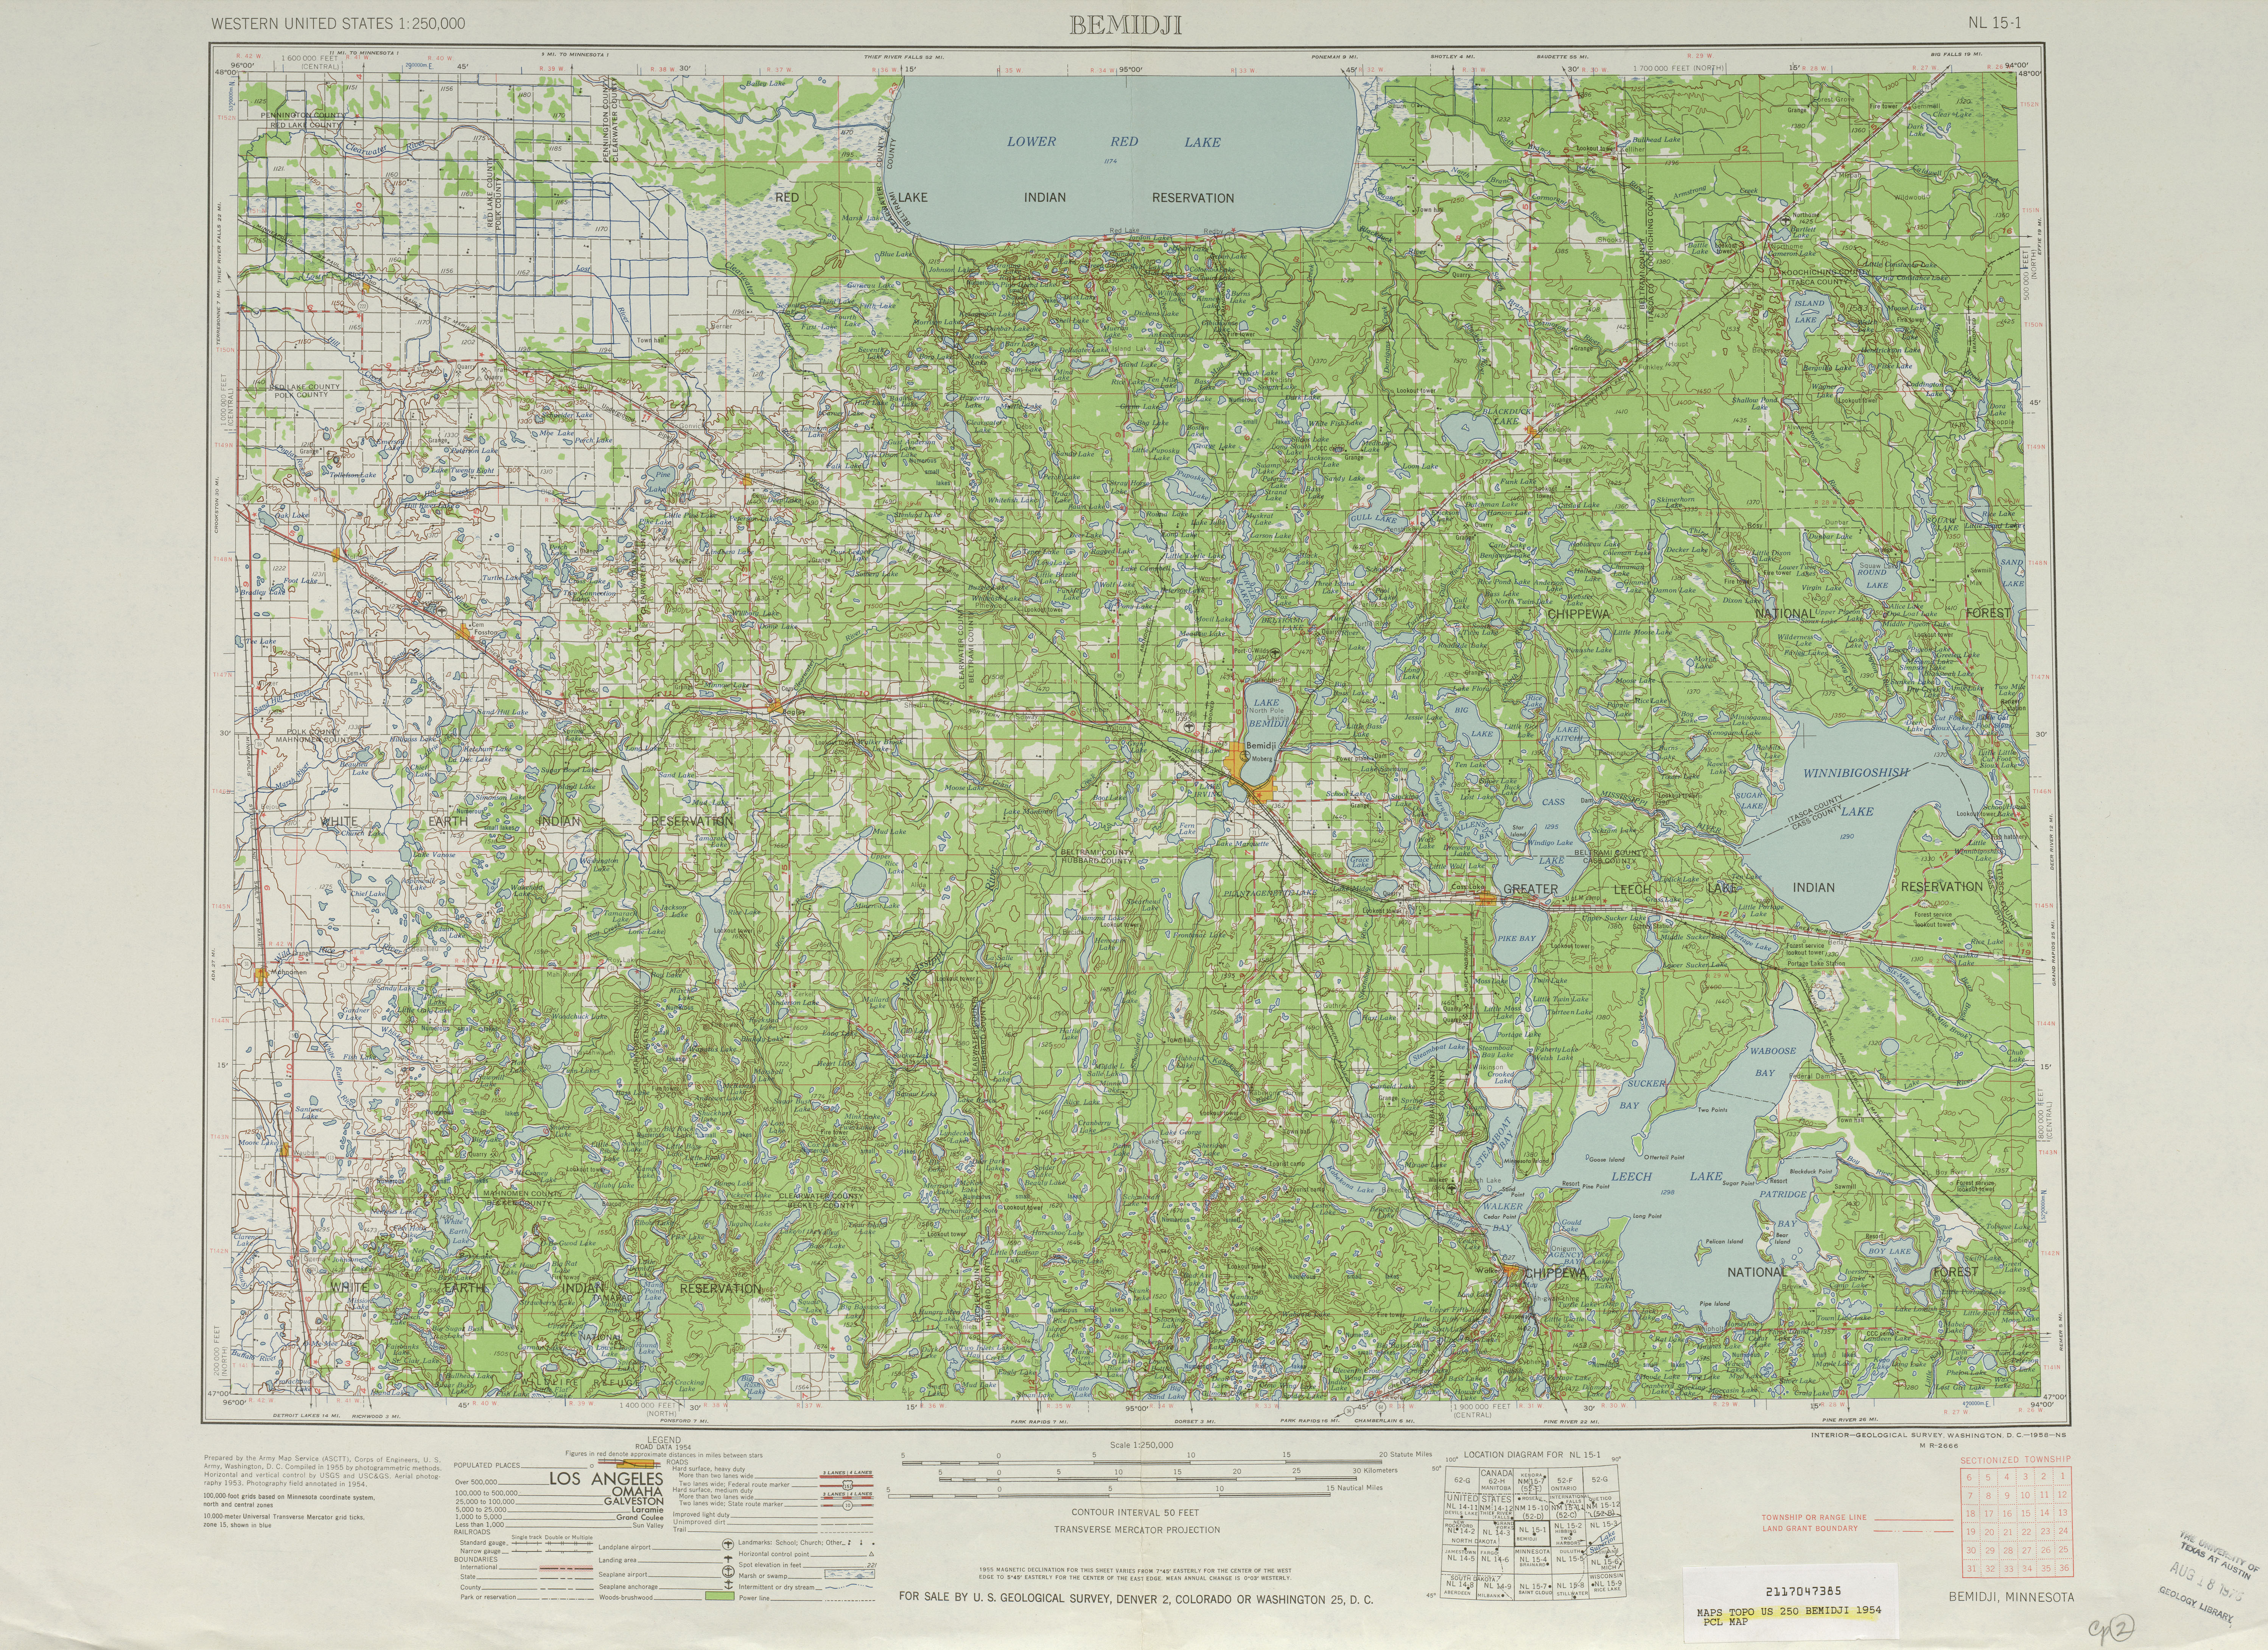 Bemidji Topographic Map Sheet, United States 1954